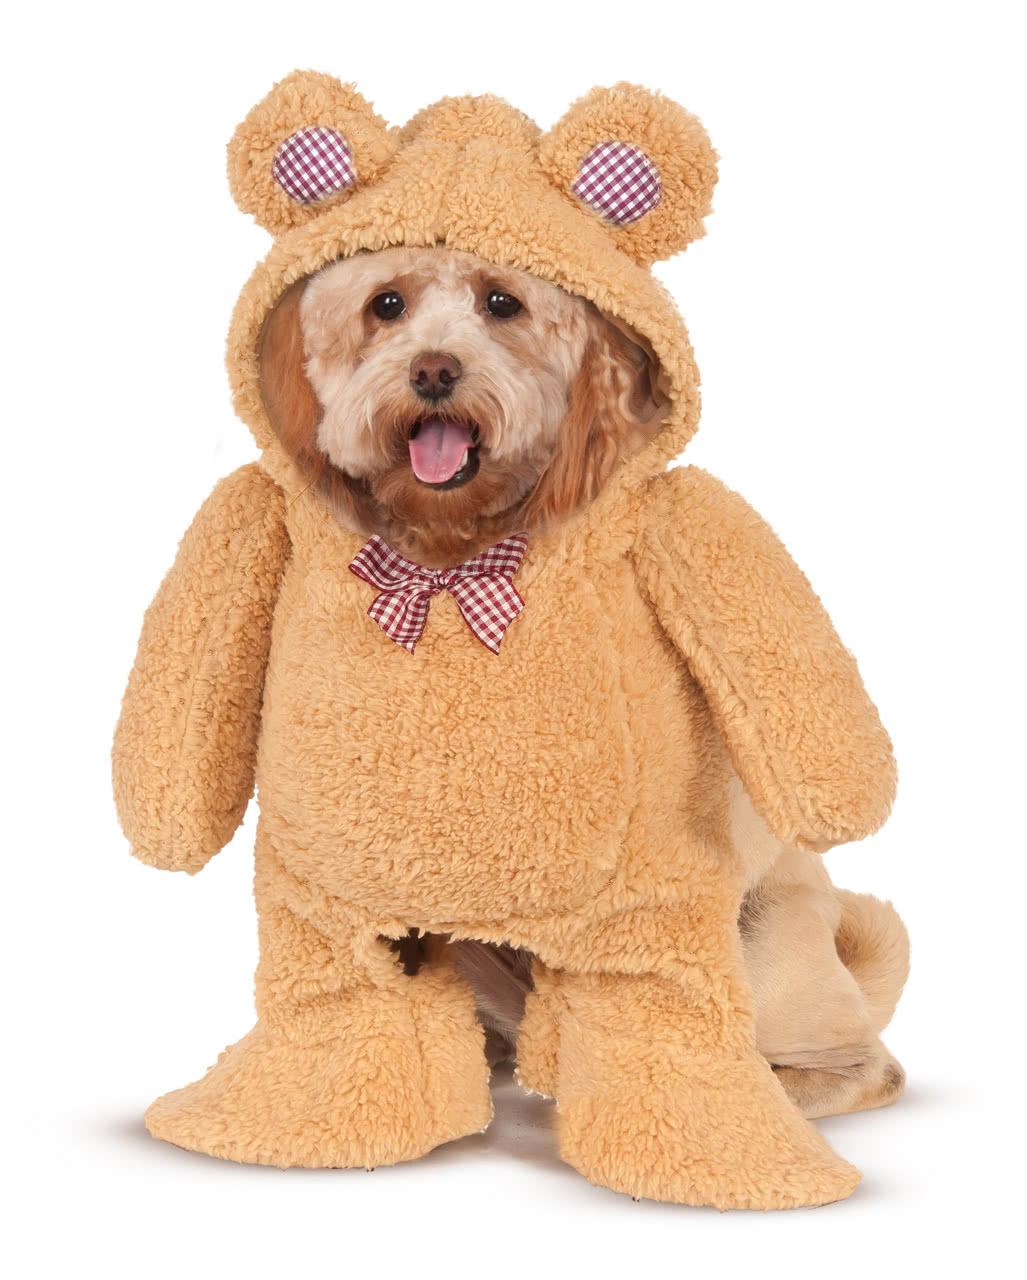 Teddy Bear Dog Costume For Halloween Horror Shop Com